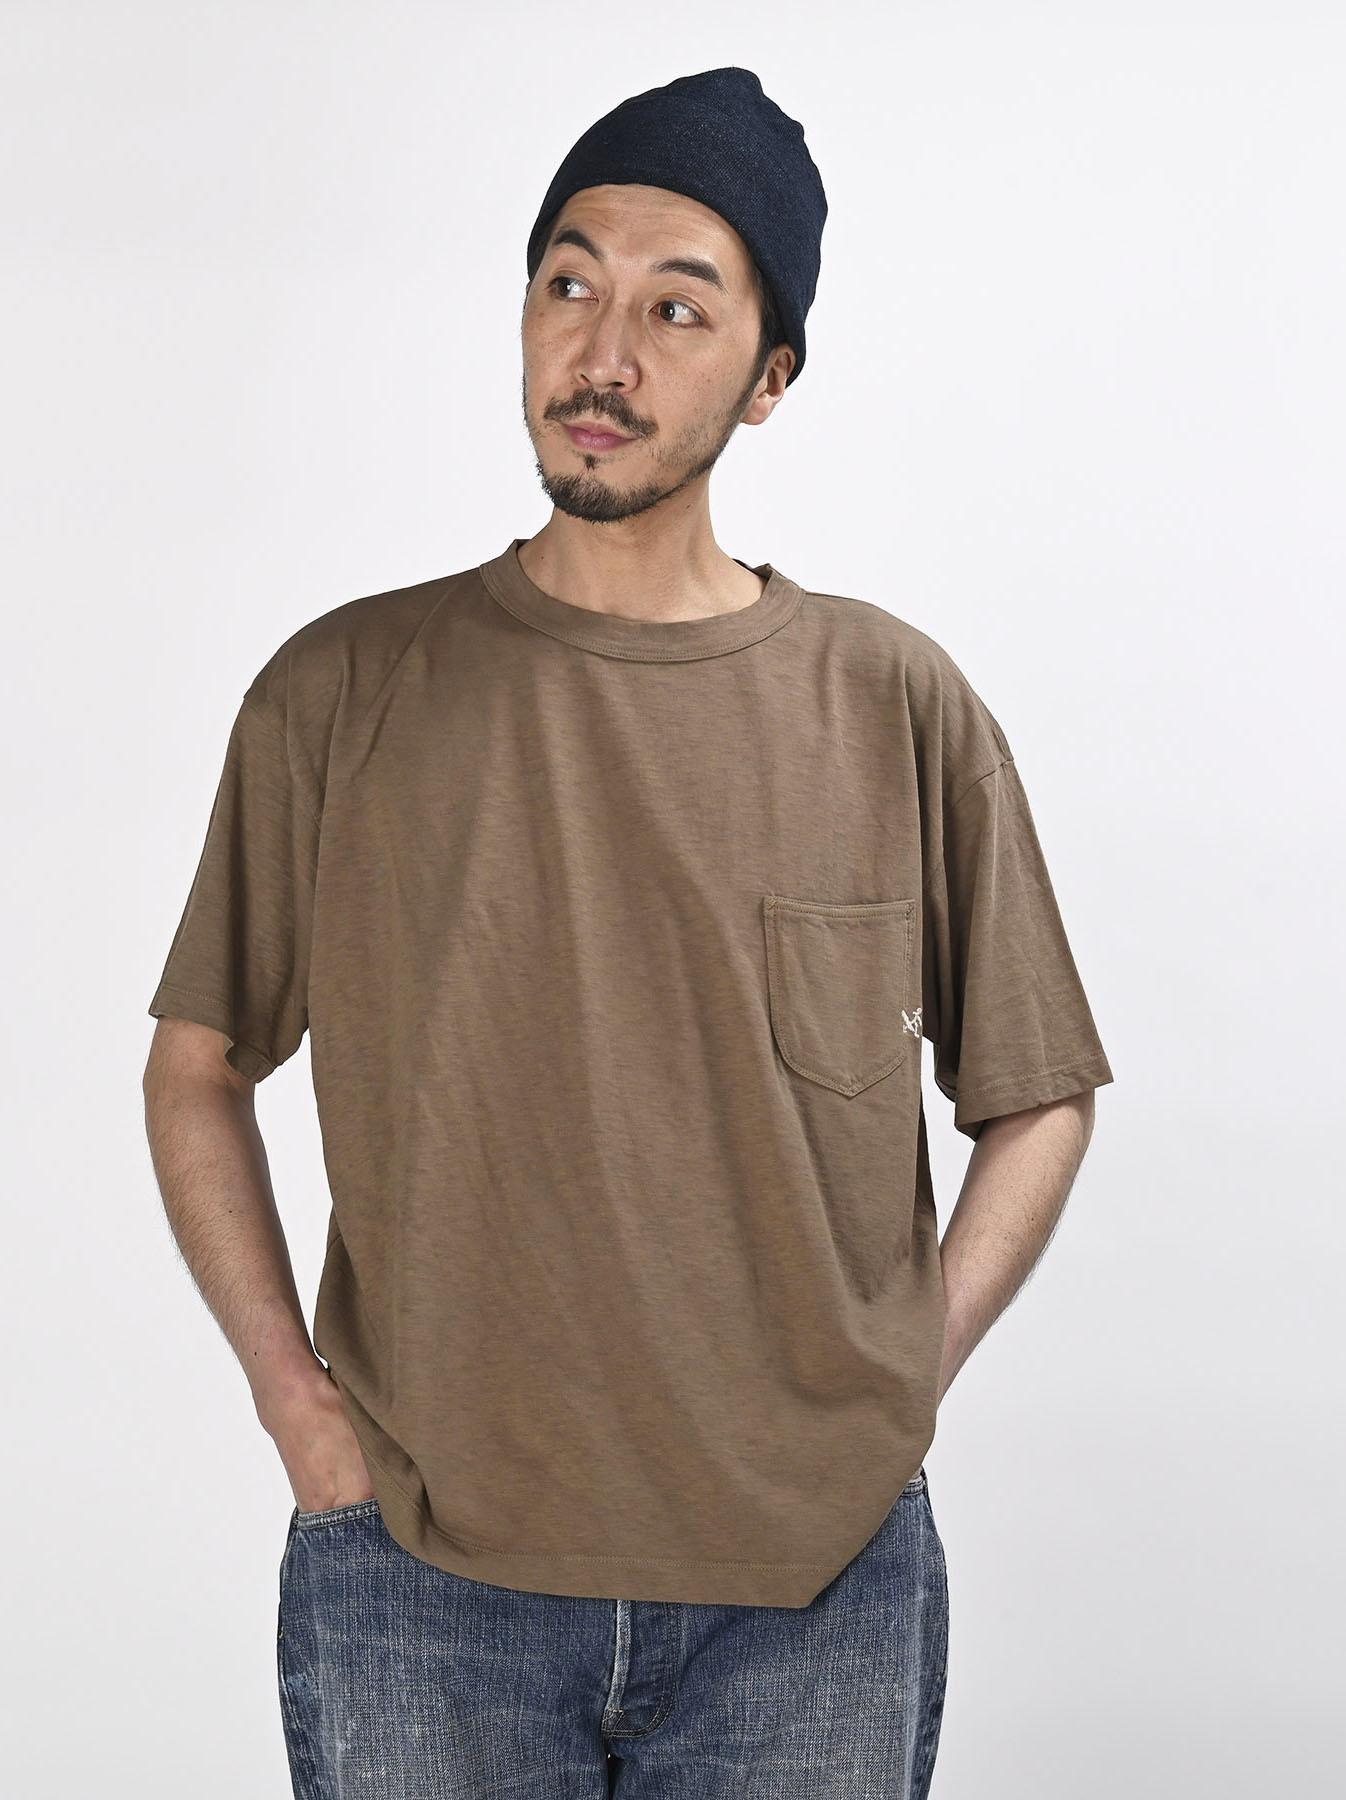 Hayama-kun Embroidered 908 Ocean T-shirt (0621)-3